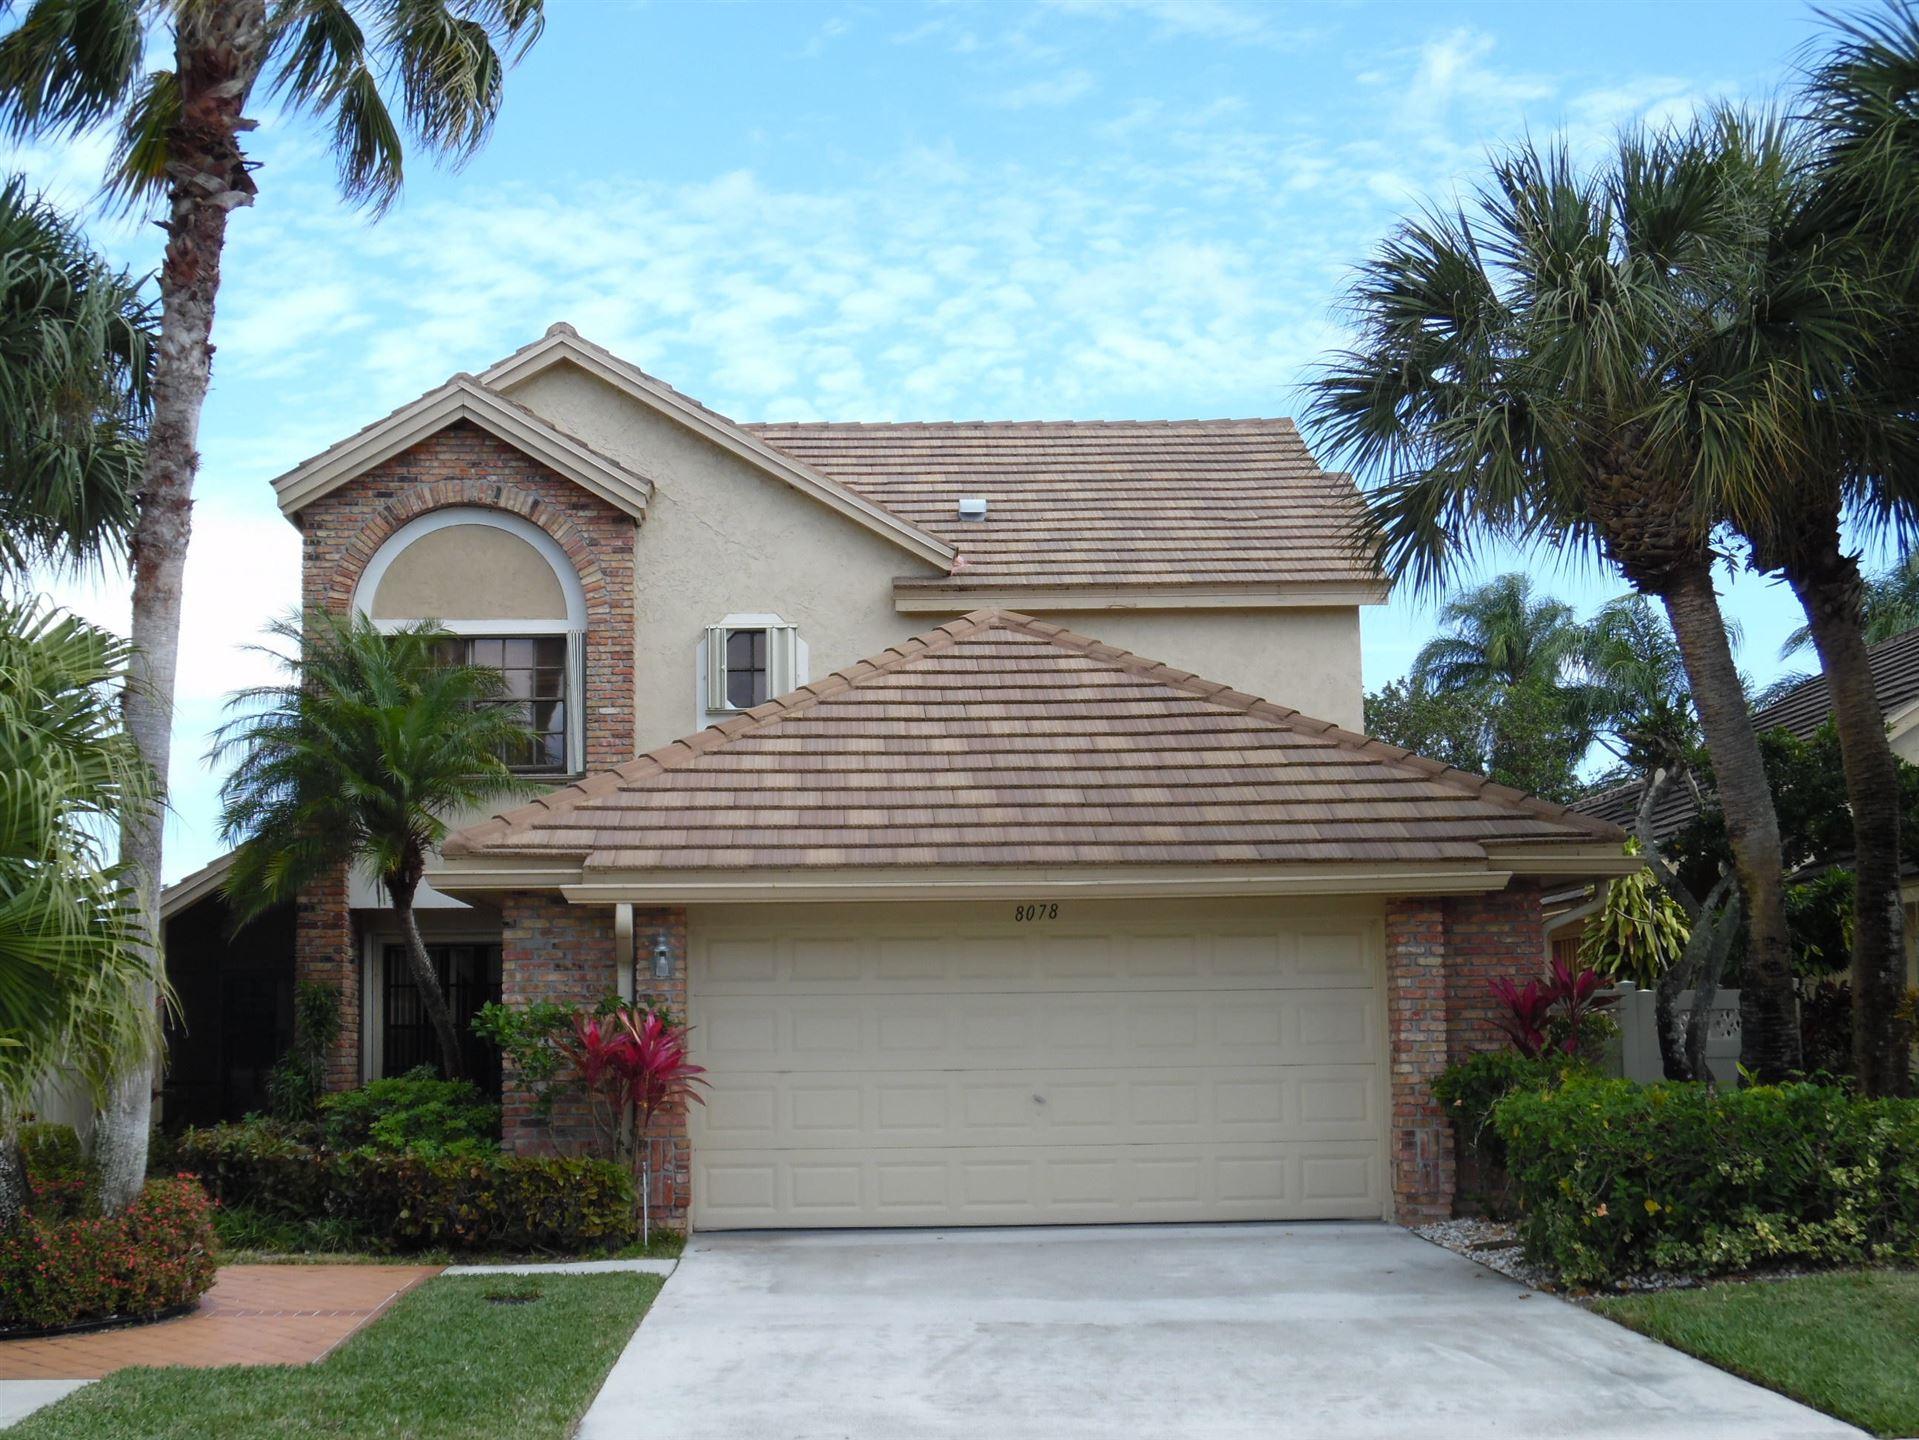 8078 Allspice Drive, Boynton Beach, FL 33472 - #: RX-10692394